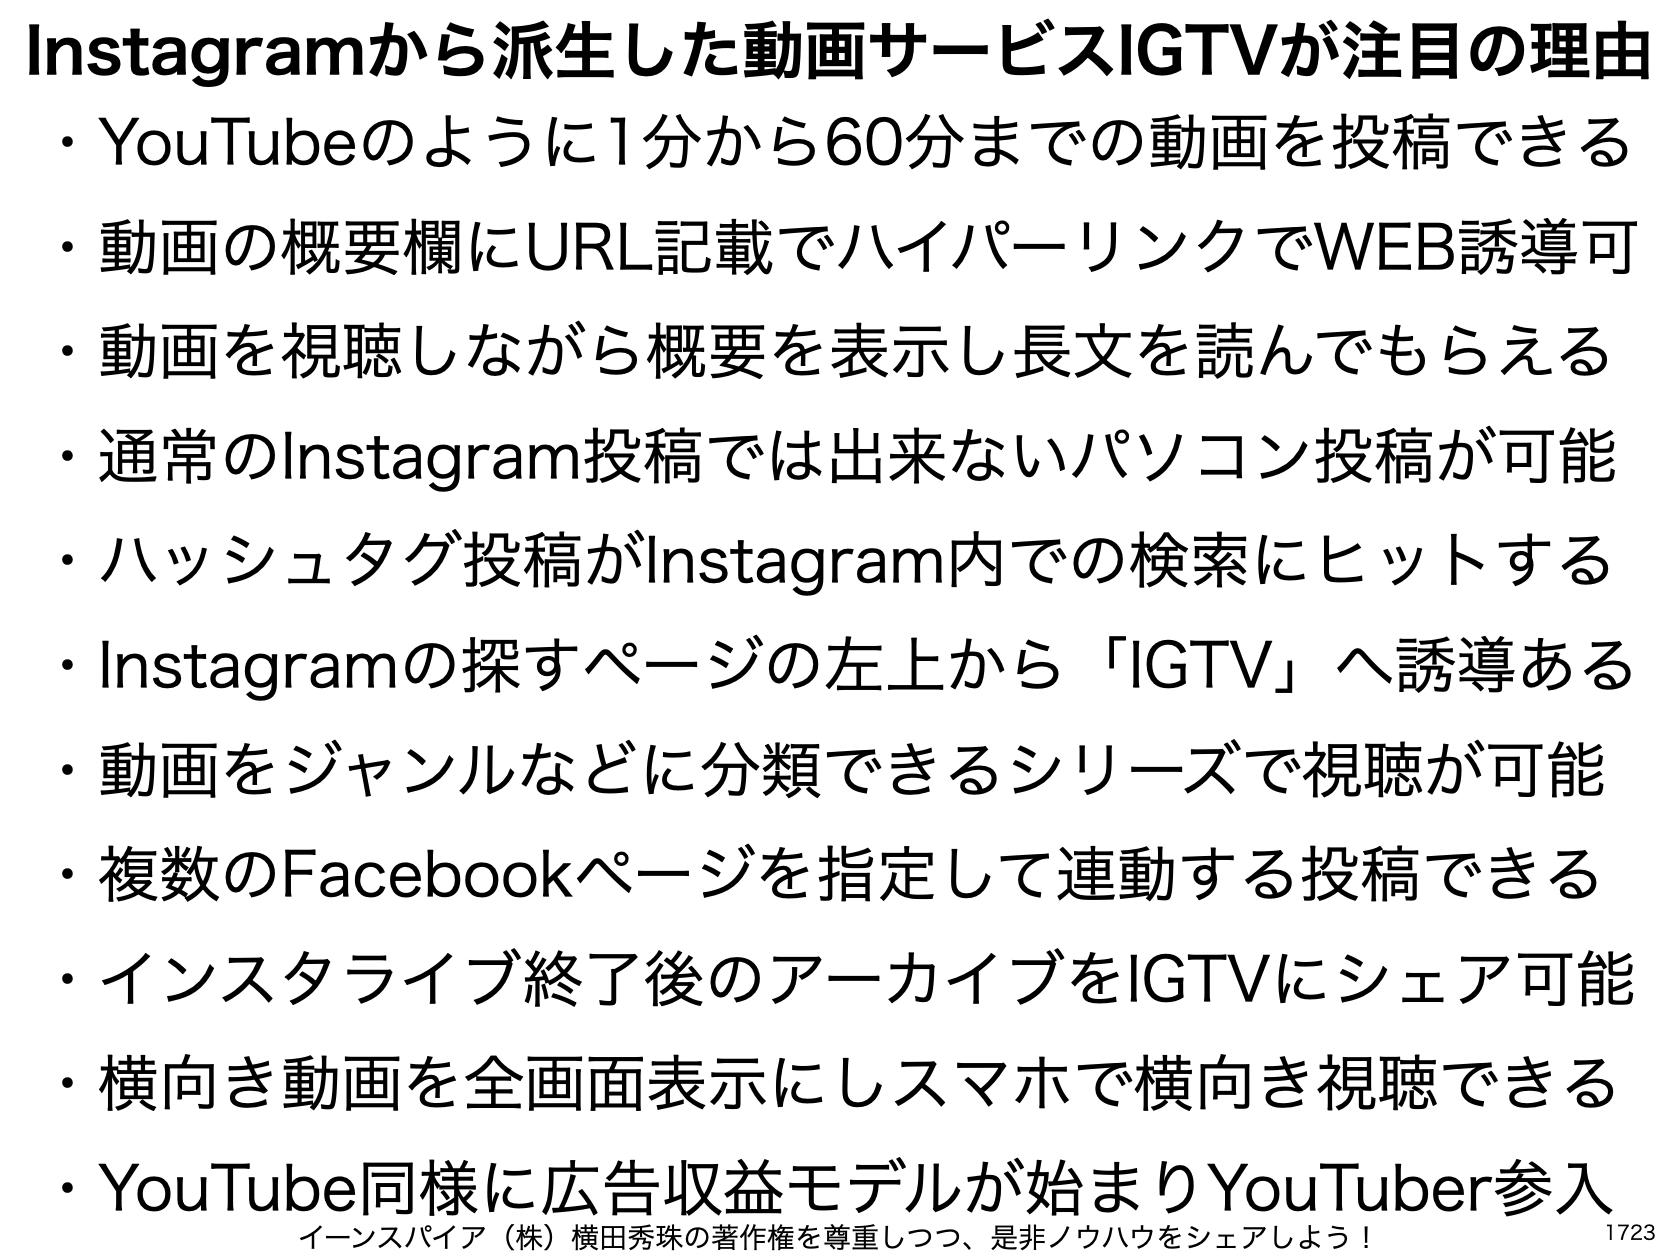 Instagramから派生した動画サービスIGTVが注目の理由